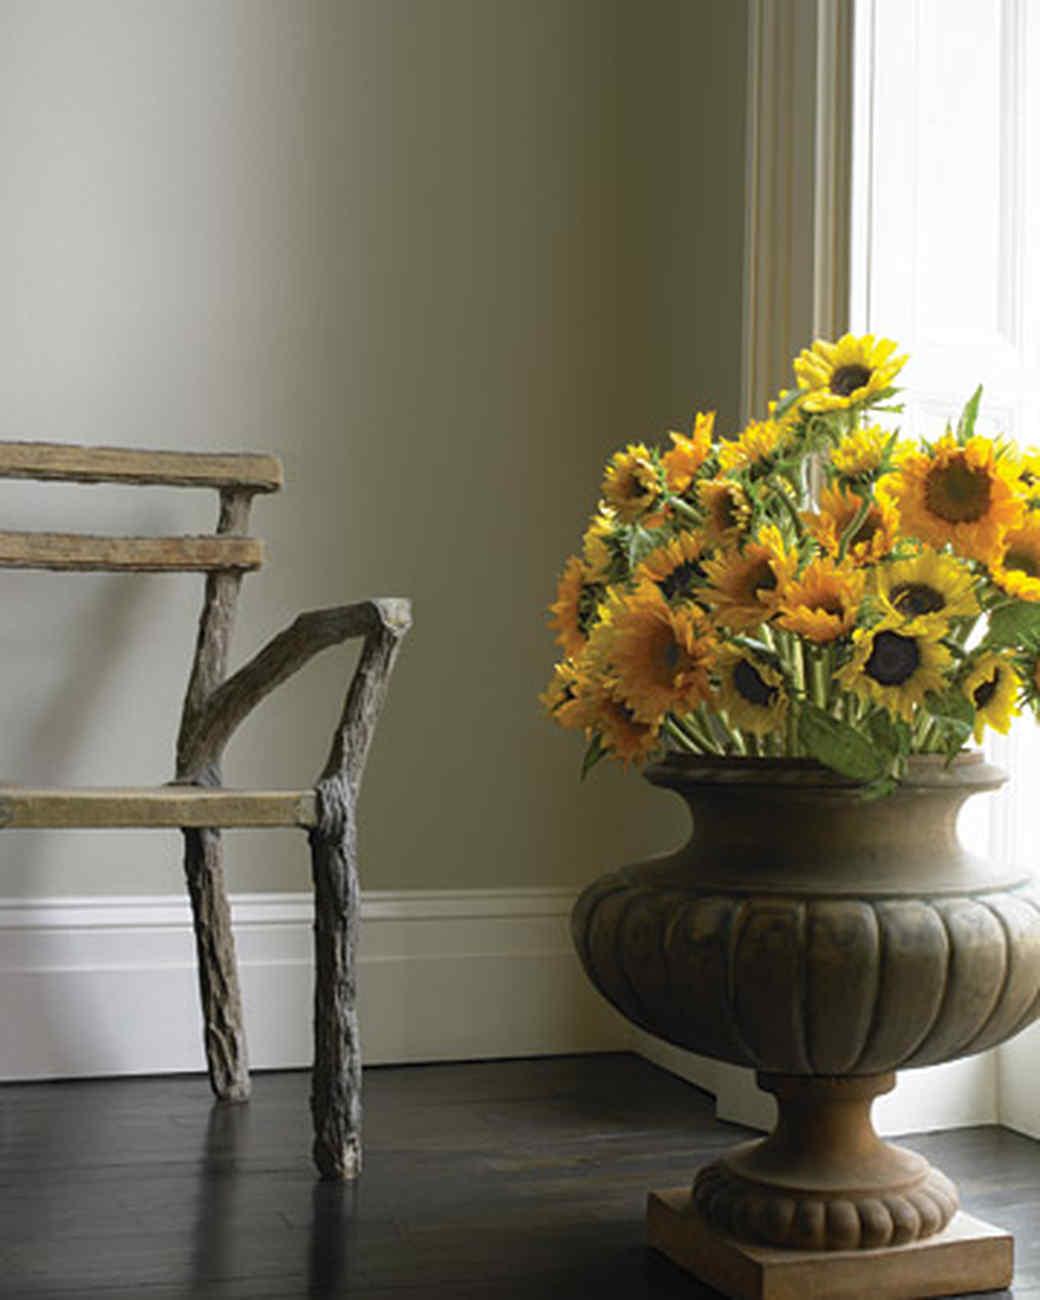 mld103117_0907_sunflowers.jpg